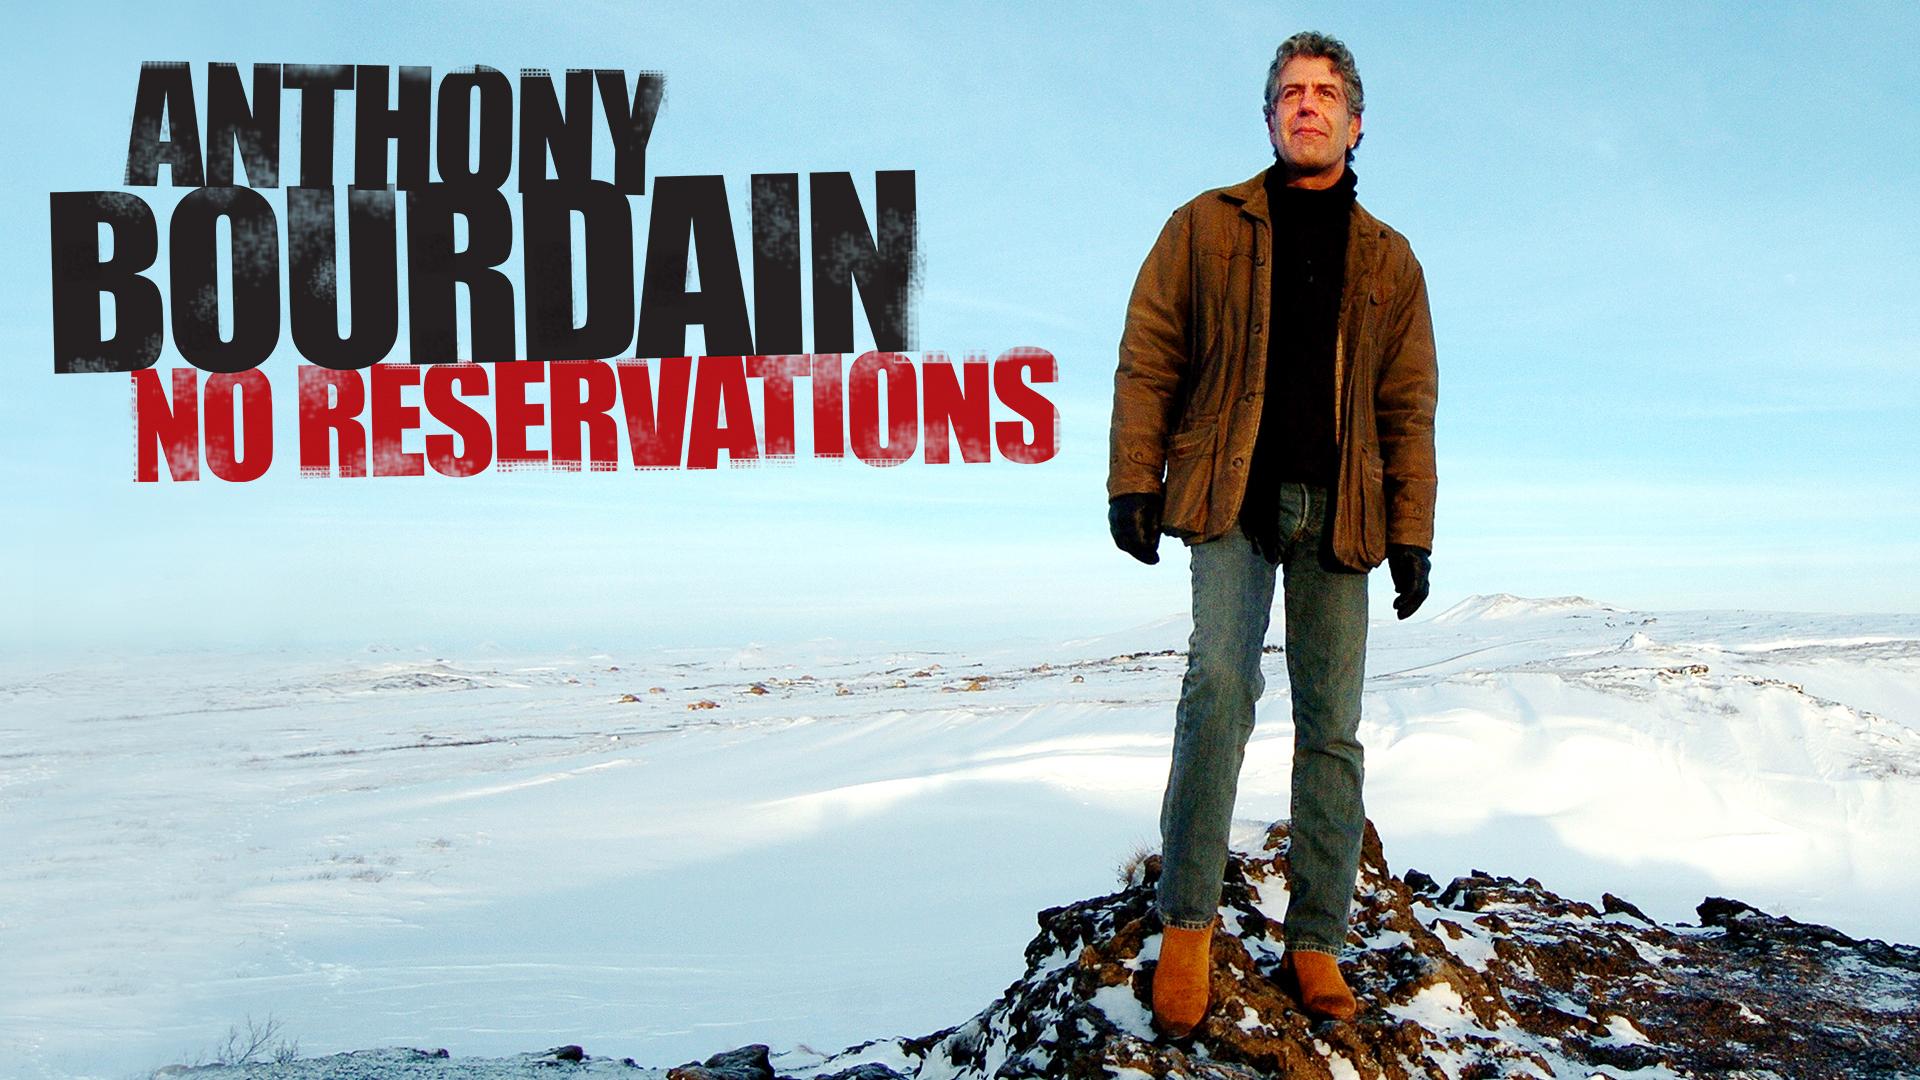 Anthony Bourdain: No Reservations - Season 1